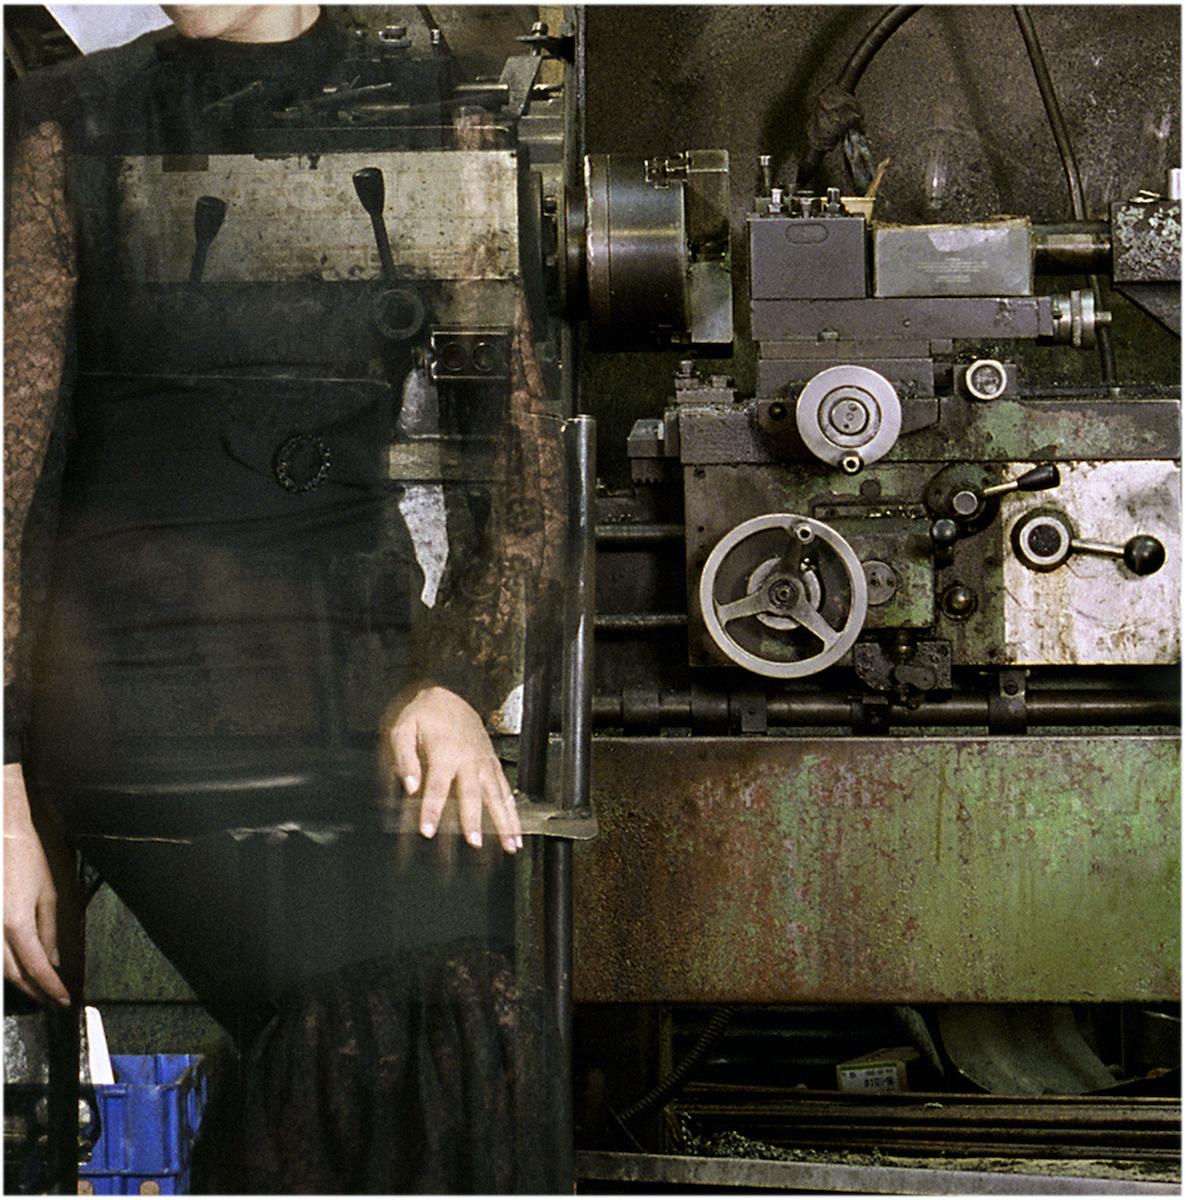 Autómatas, 2008/2021 © Linarejos Moreno